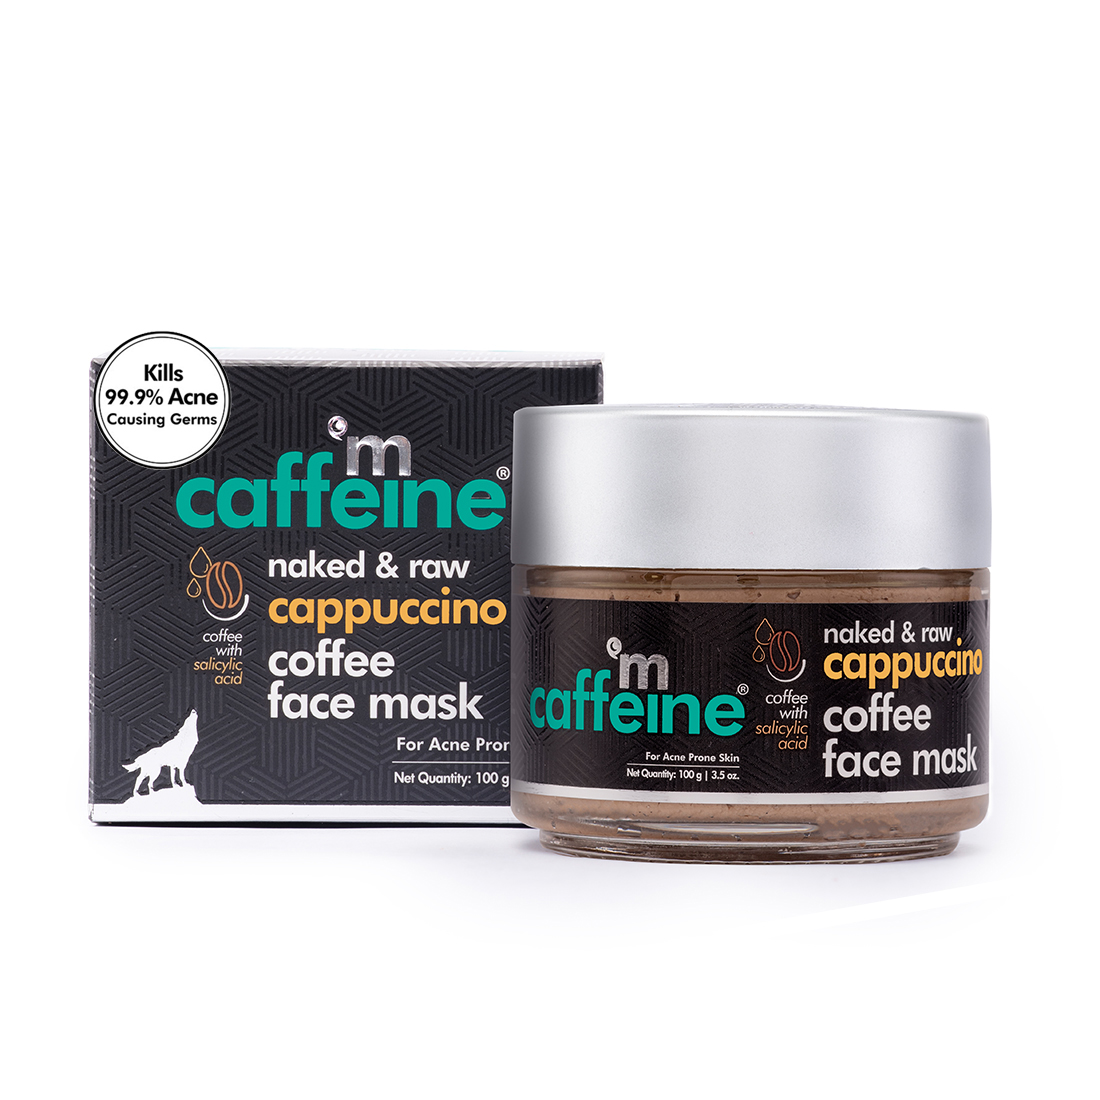 MCaffeine | mCaffeine Naked & Raw Cappuccino Coffee Face Mask